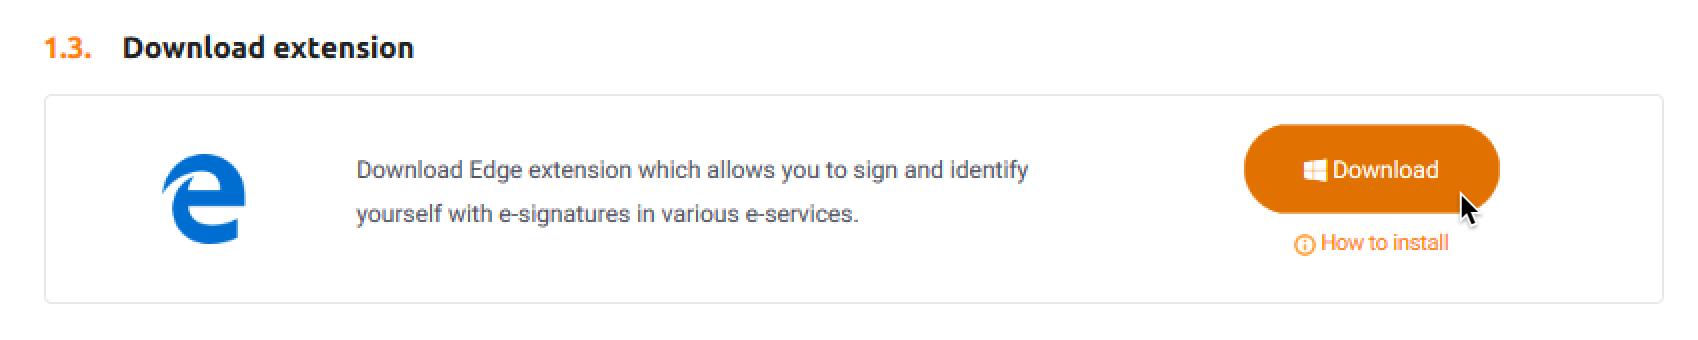 Microsoft Edge extension and e-signature device drivers